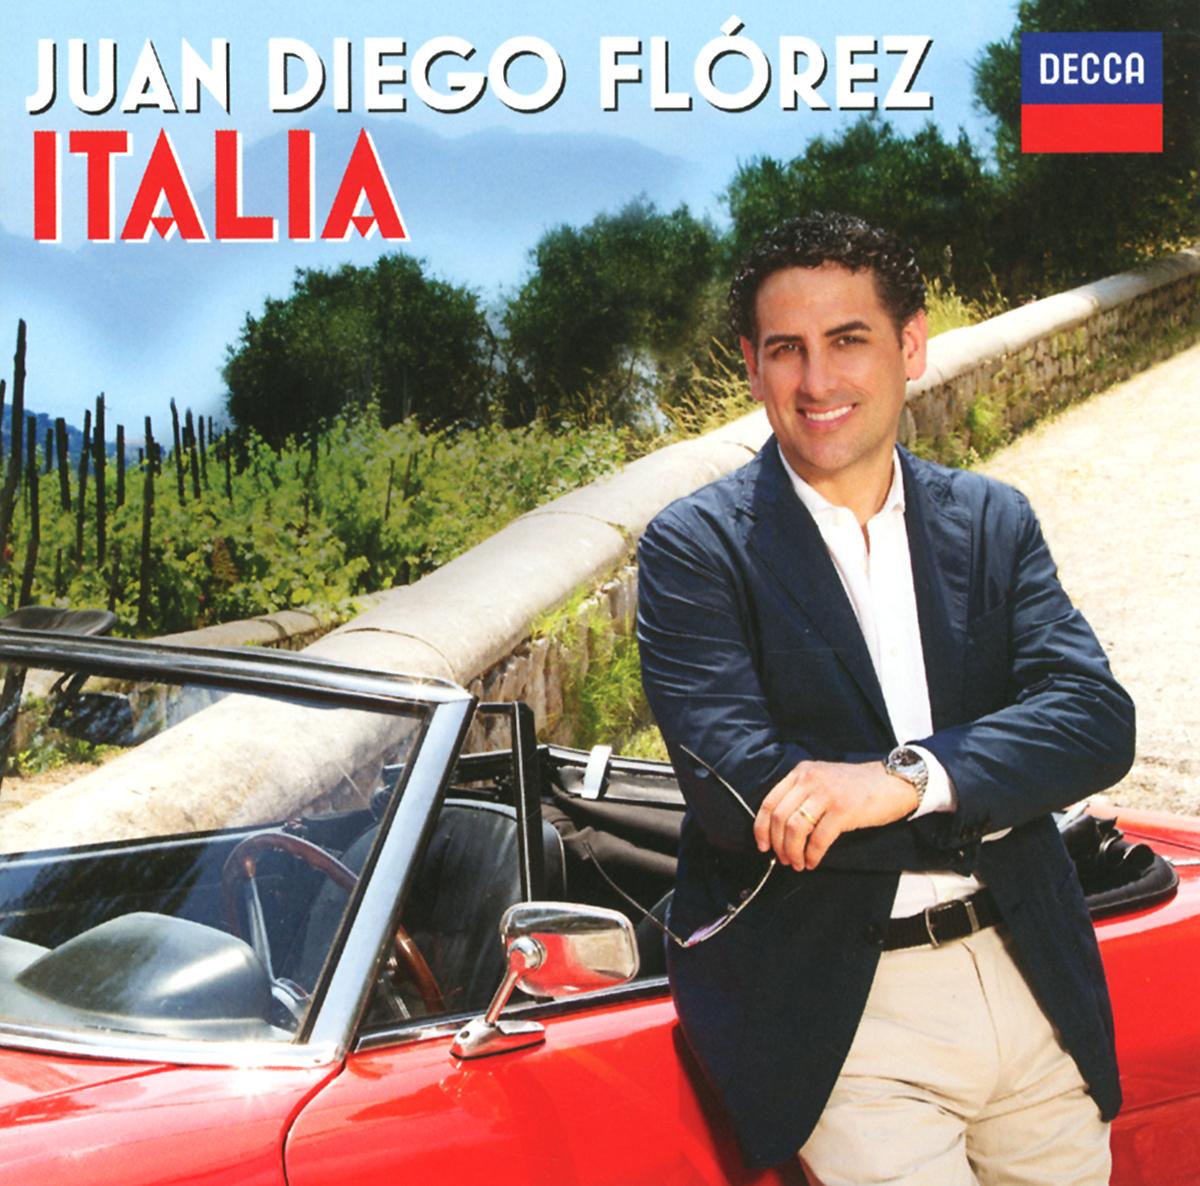 Хуан Диего Флорес Juan Diego Florez. Italian donizetti juan diego florez patrizia ciofi la fille du regiment 2 dvd